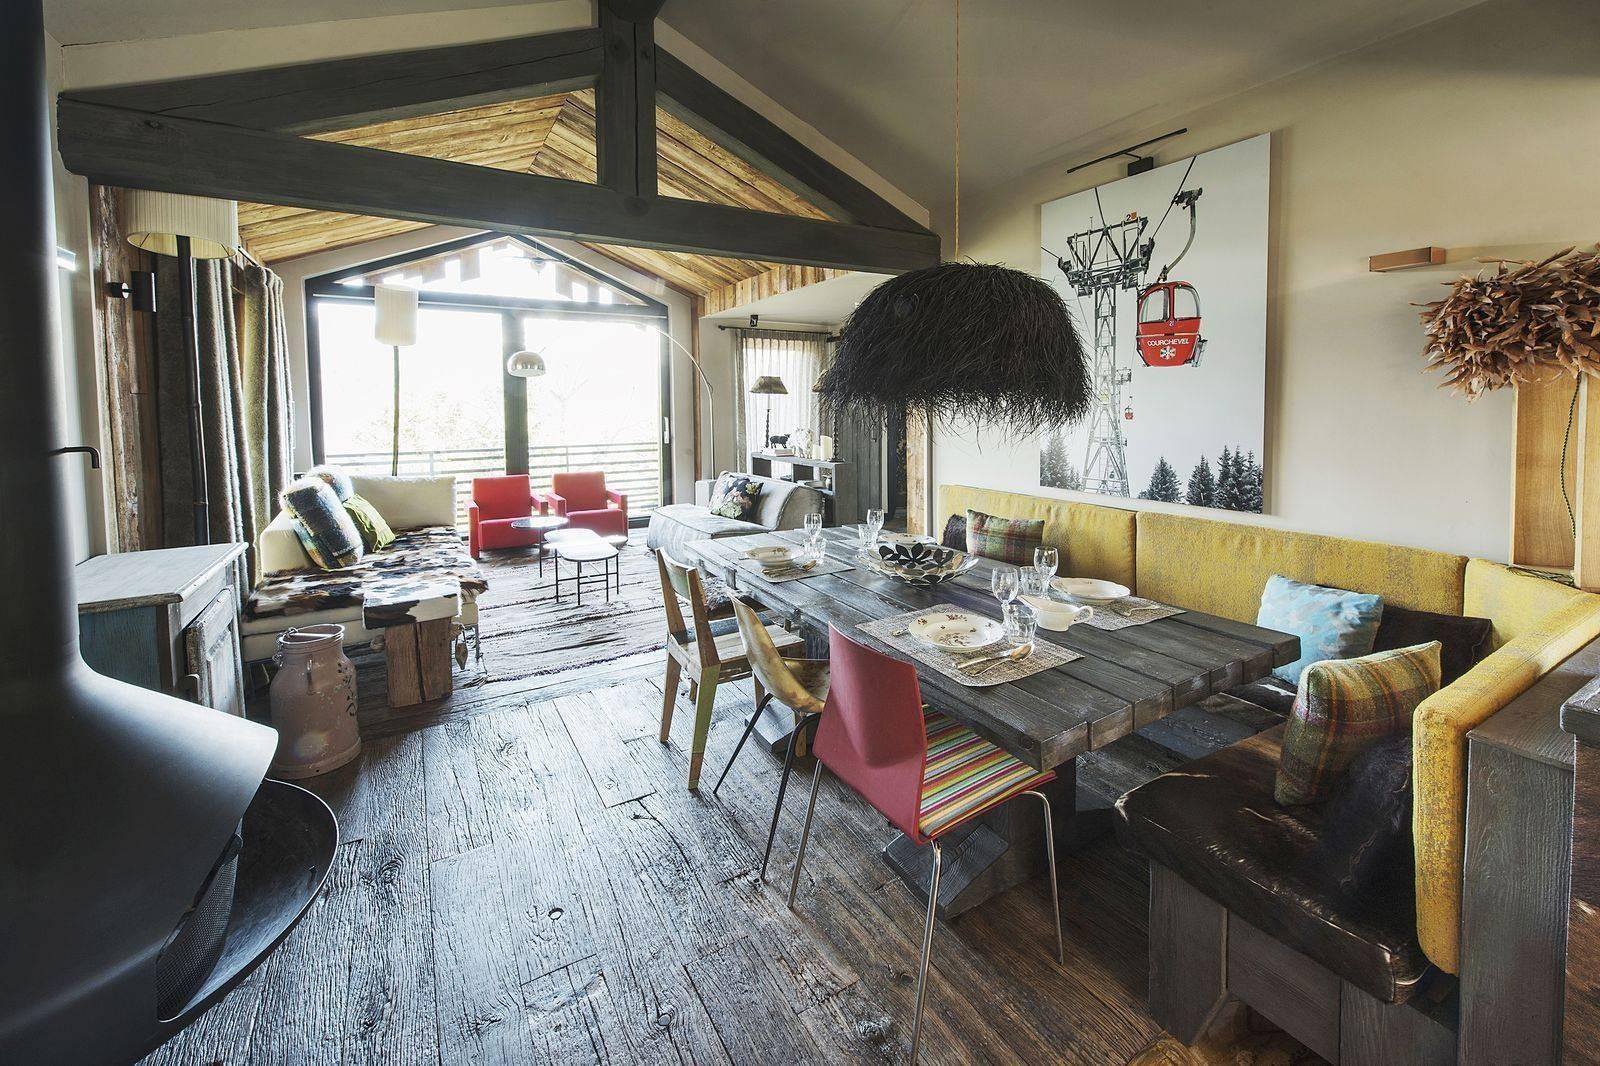 Courchevel 1550 Luxury Rental Chalet Niibite Dining Room